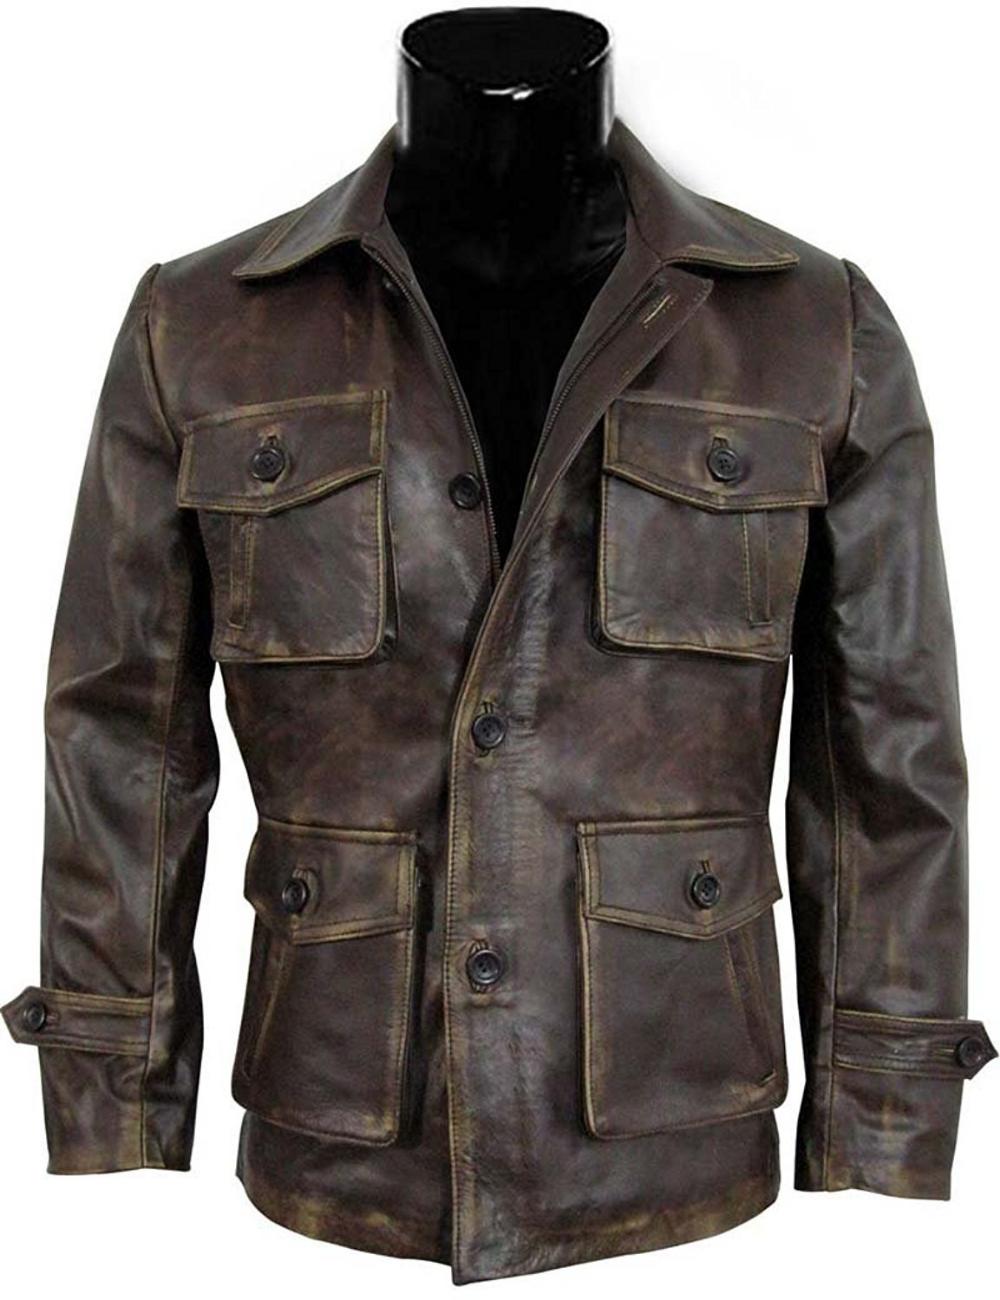 Handmade Men S Leather Jacket Expendables 2 Jason Style Distressed Look On Luulla Distressed Leather Jacket Leather Jacket Leather Jacket Men [ 1300 x 1000 Pixel ]